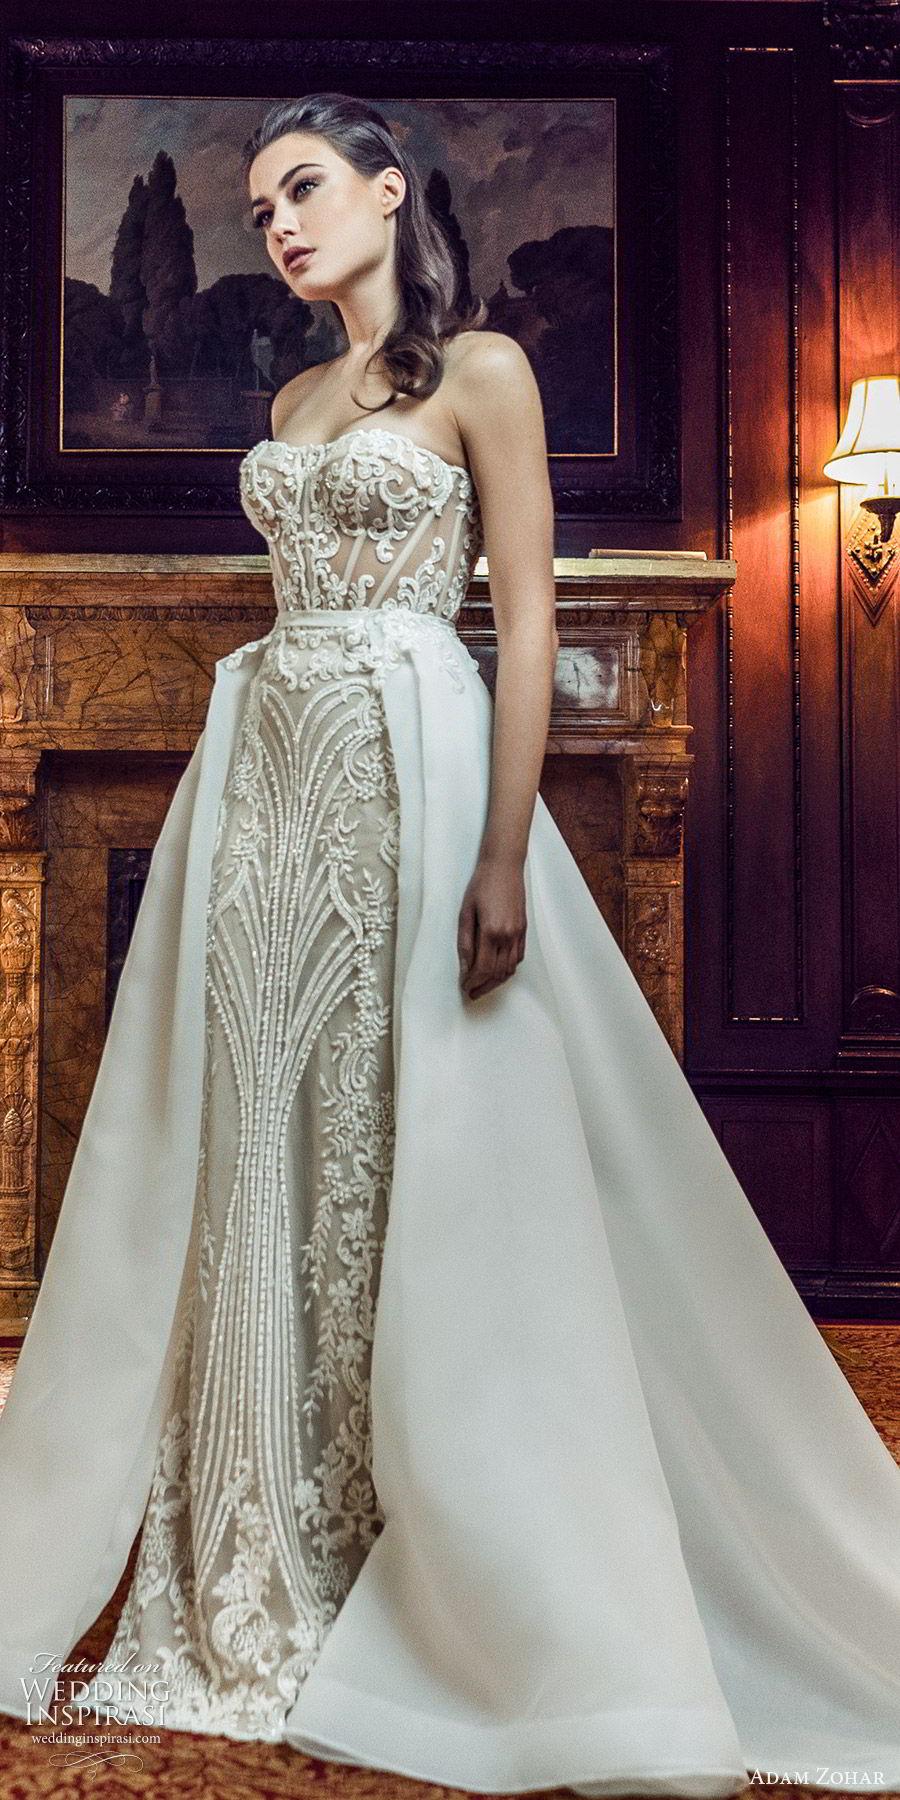 adam zohar 2020 bridal strapless sweetheart fully embellished lace sheath wedding dress ball gown overskirt (11) glam elegant chapel train mv